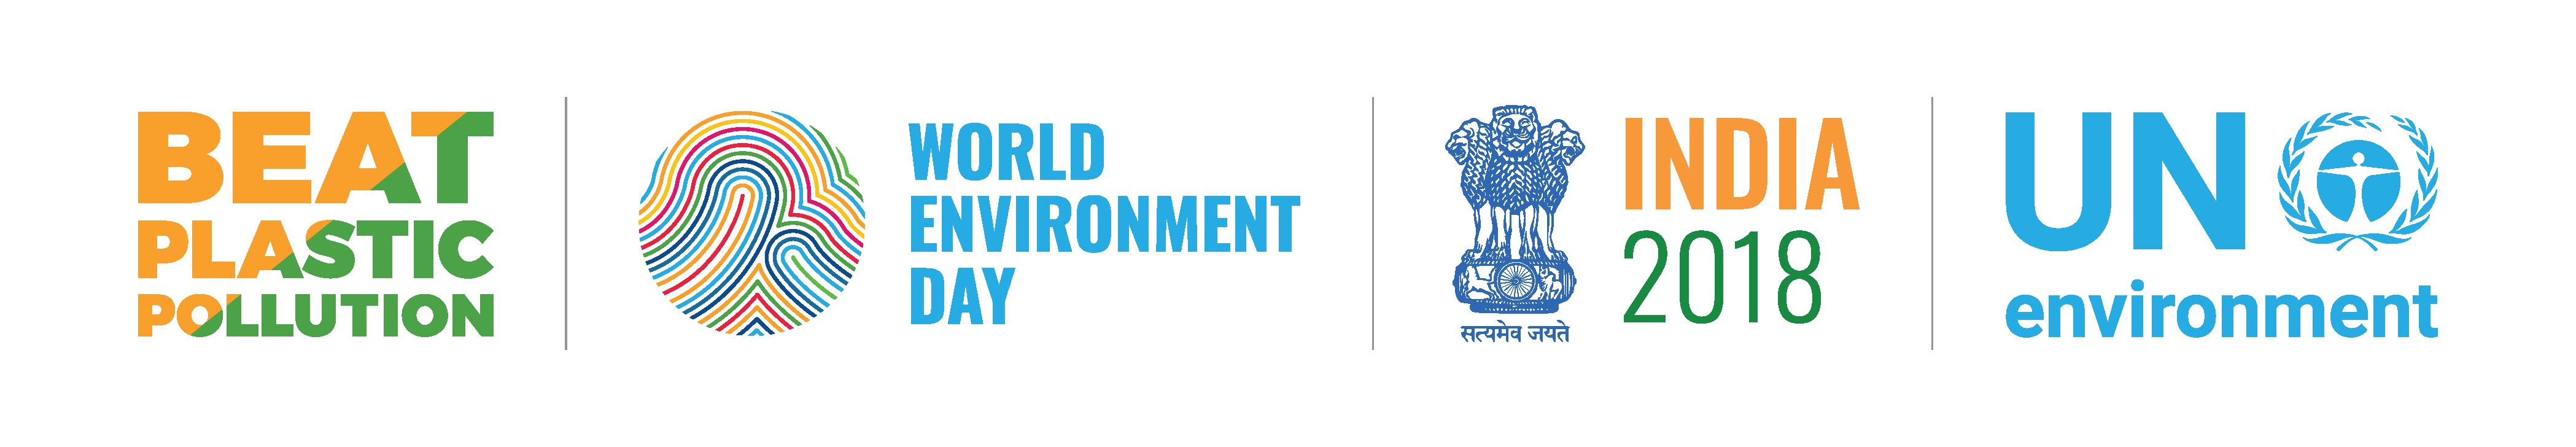 Beat plastic pollution world. Environment clipart environment word